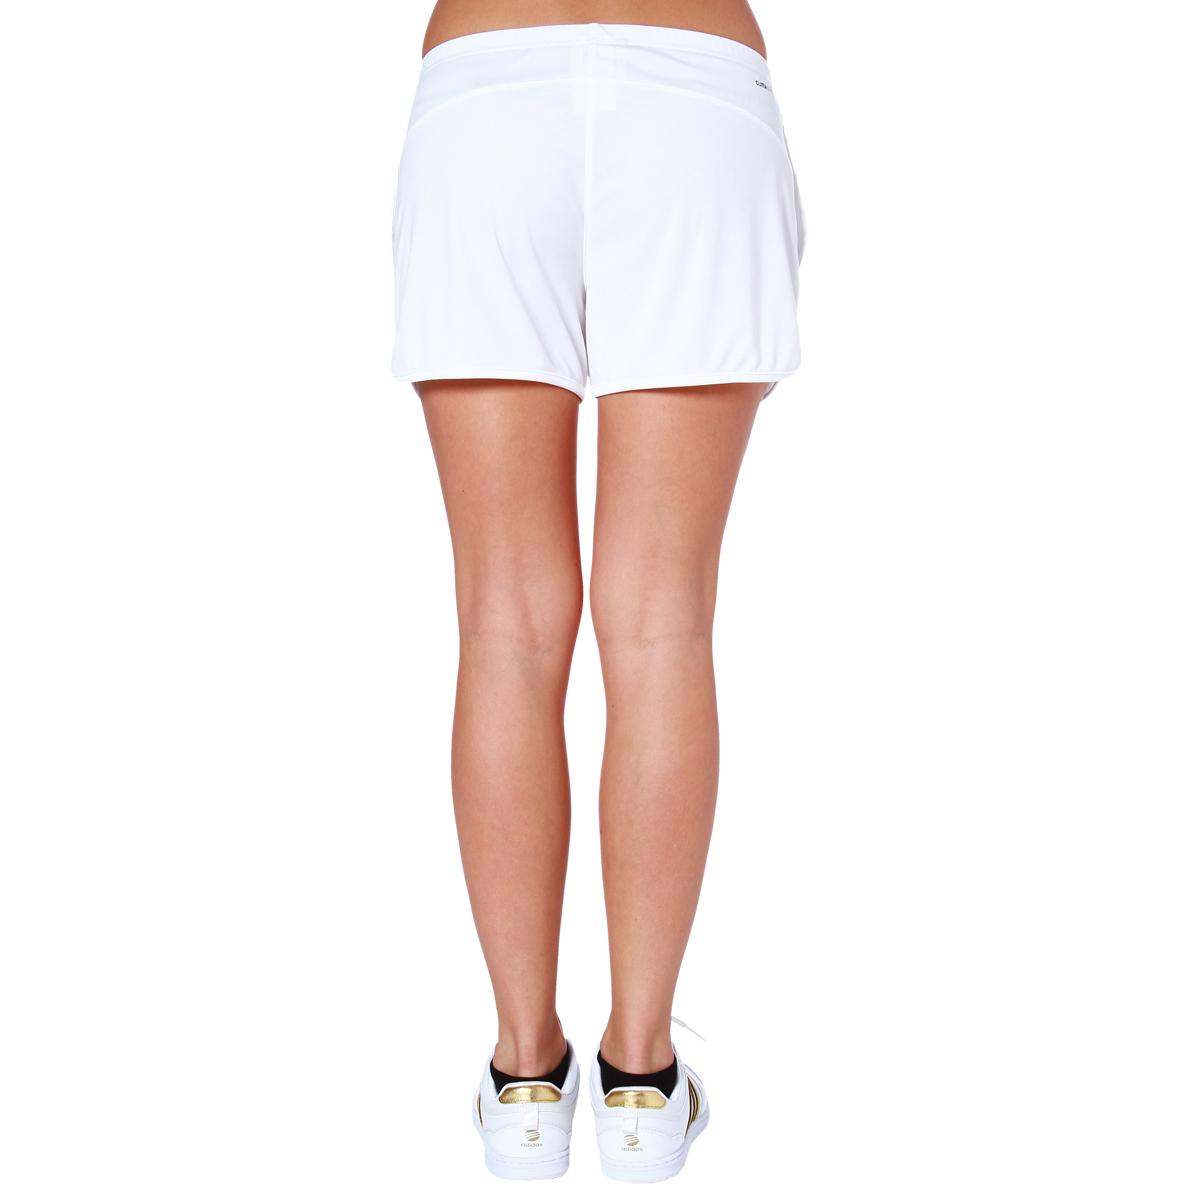 adidas basic damen tennis knit short fitness shorts. Black Bedroom Furniture Sets. Home Design Ideas